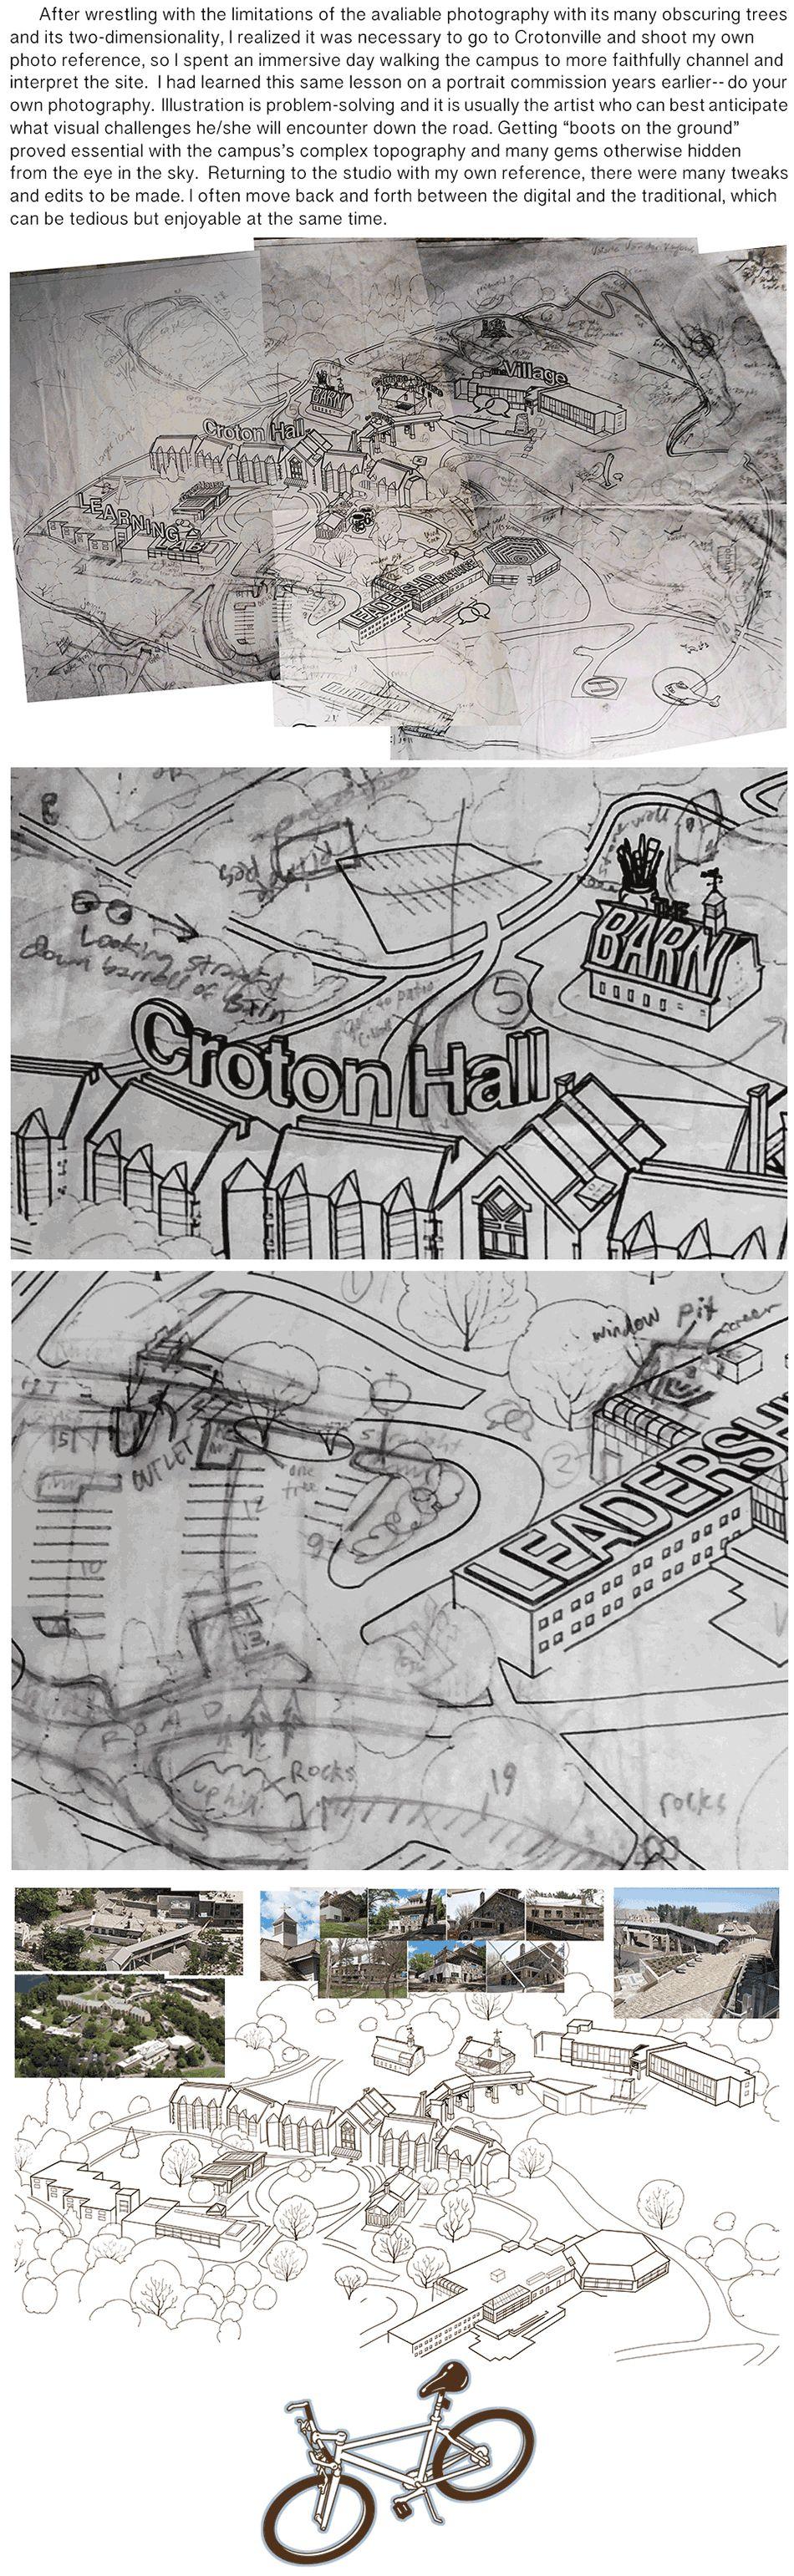 Crotonville Campus Map - GE